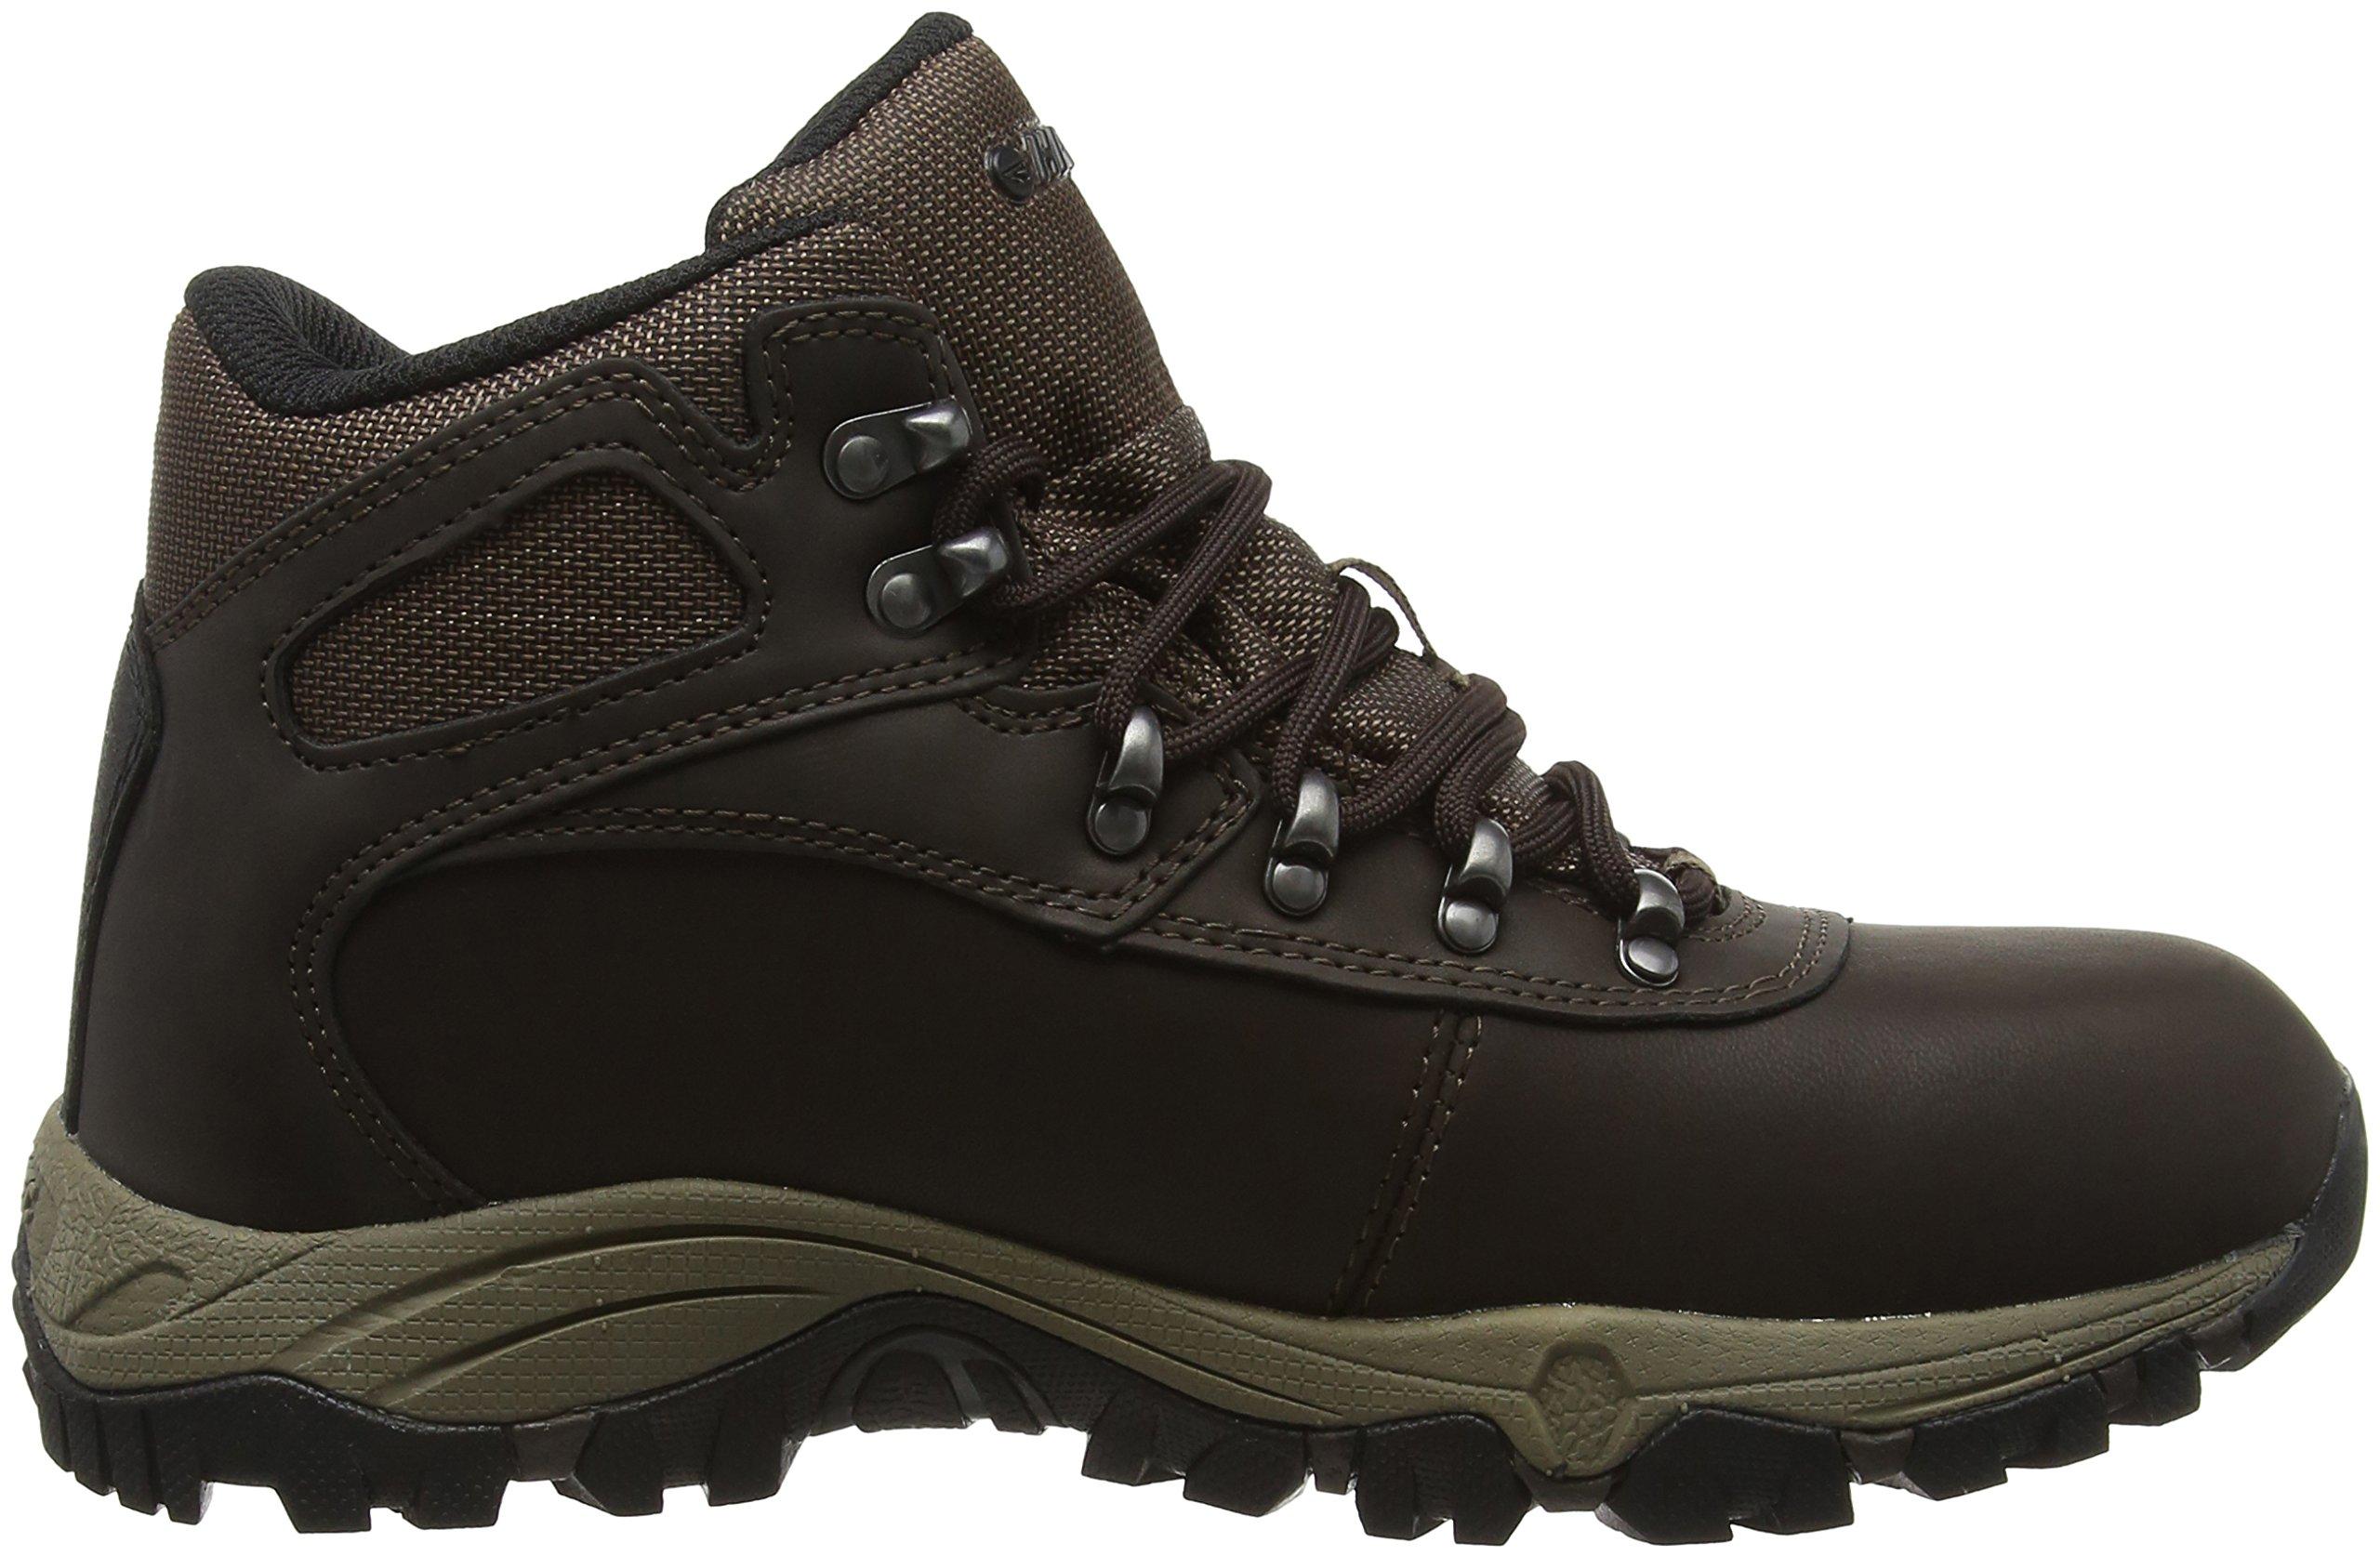 Hi-Tec Women's Cascadia Waterproof High Rise Hiking Boots 6